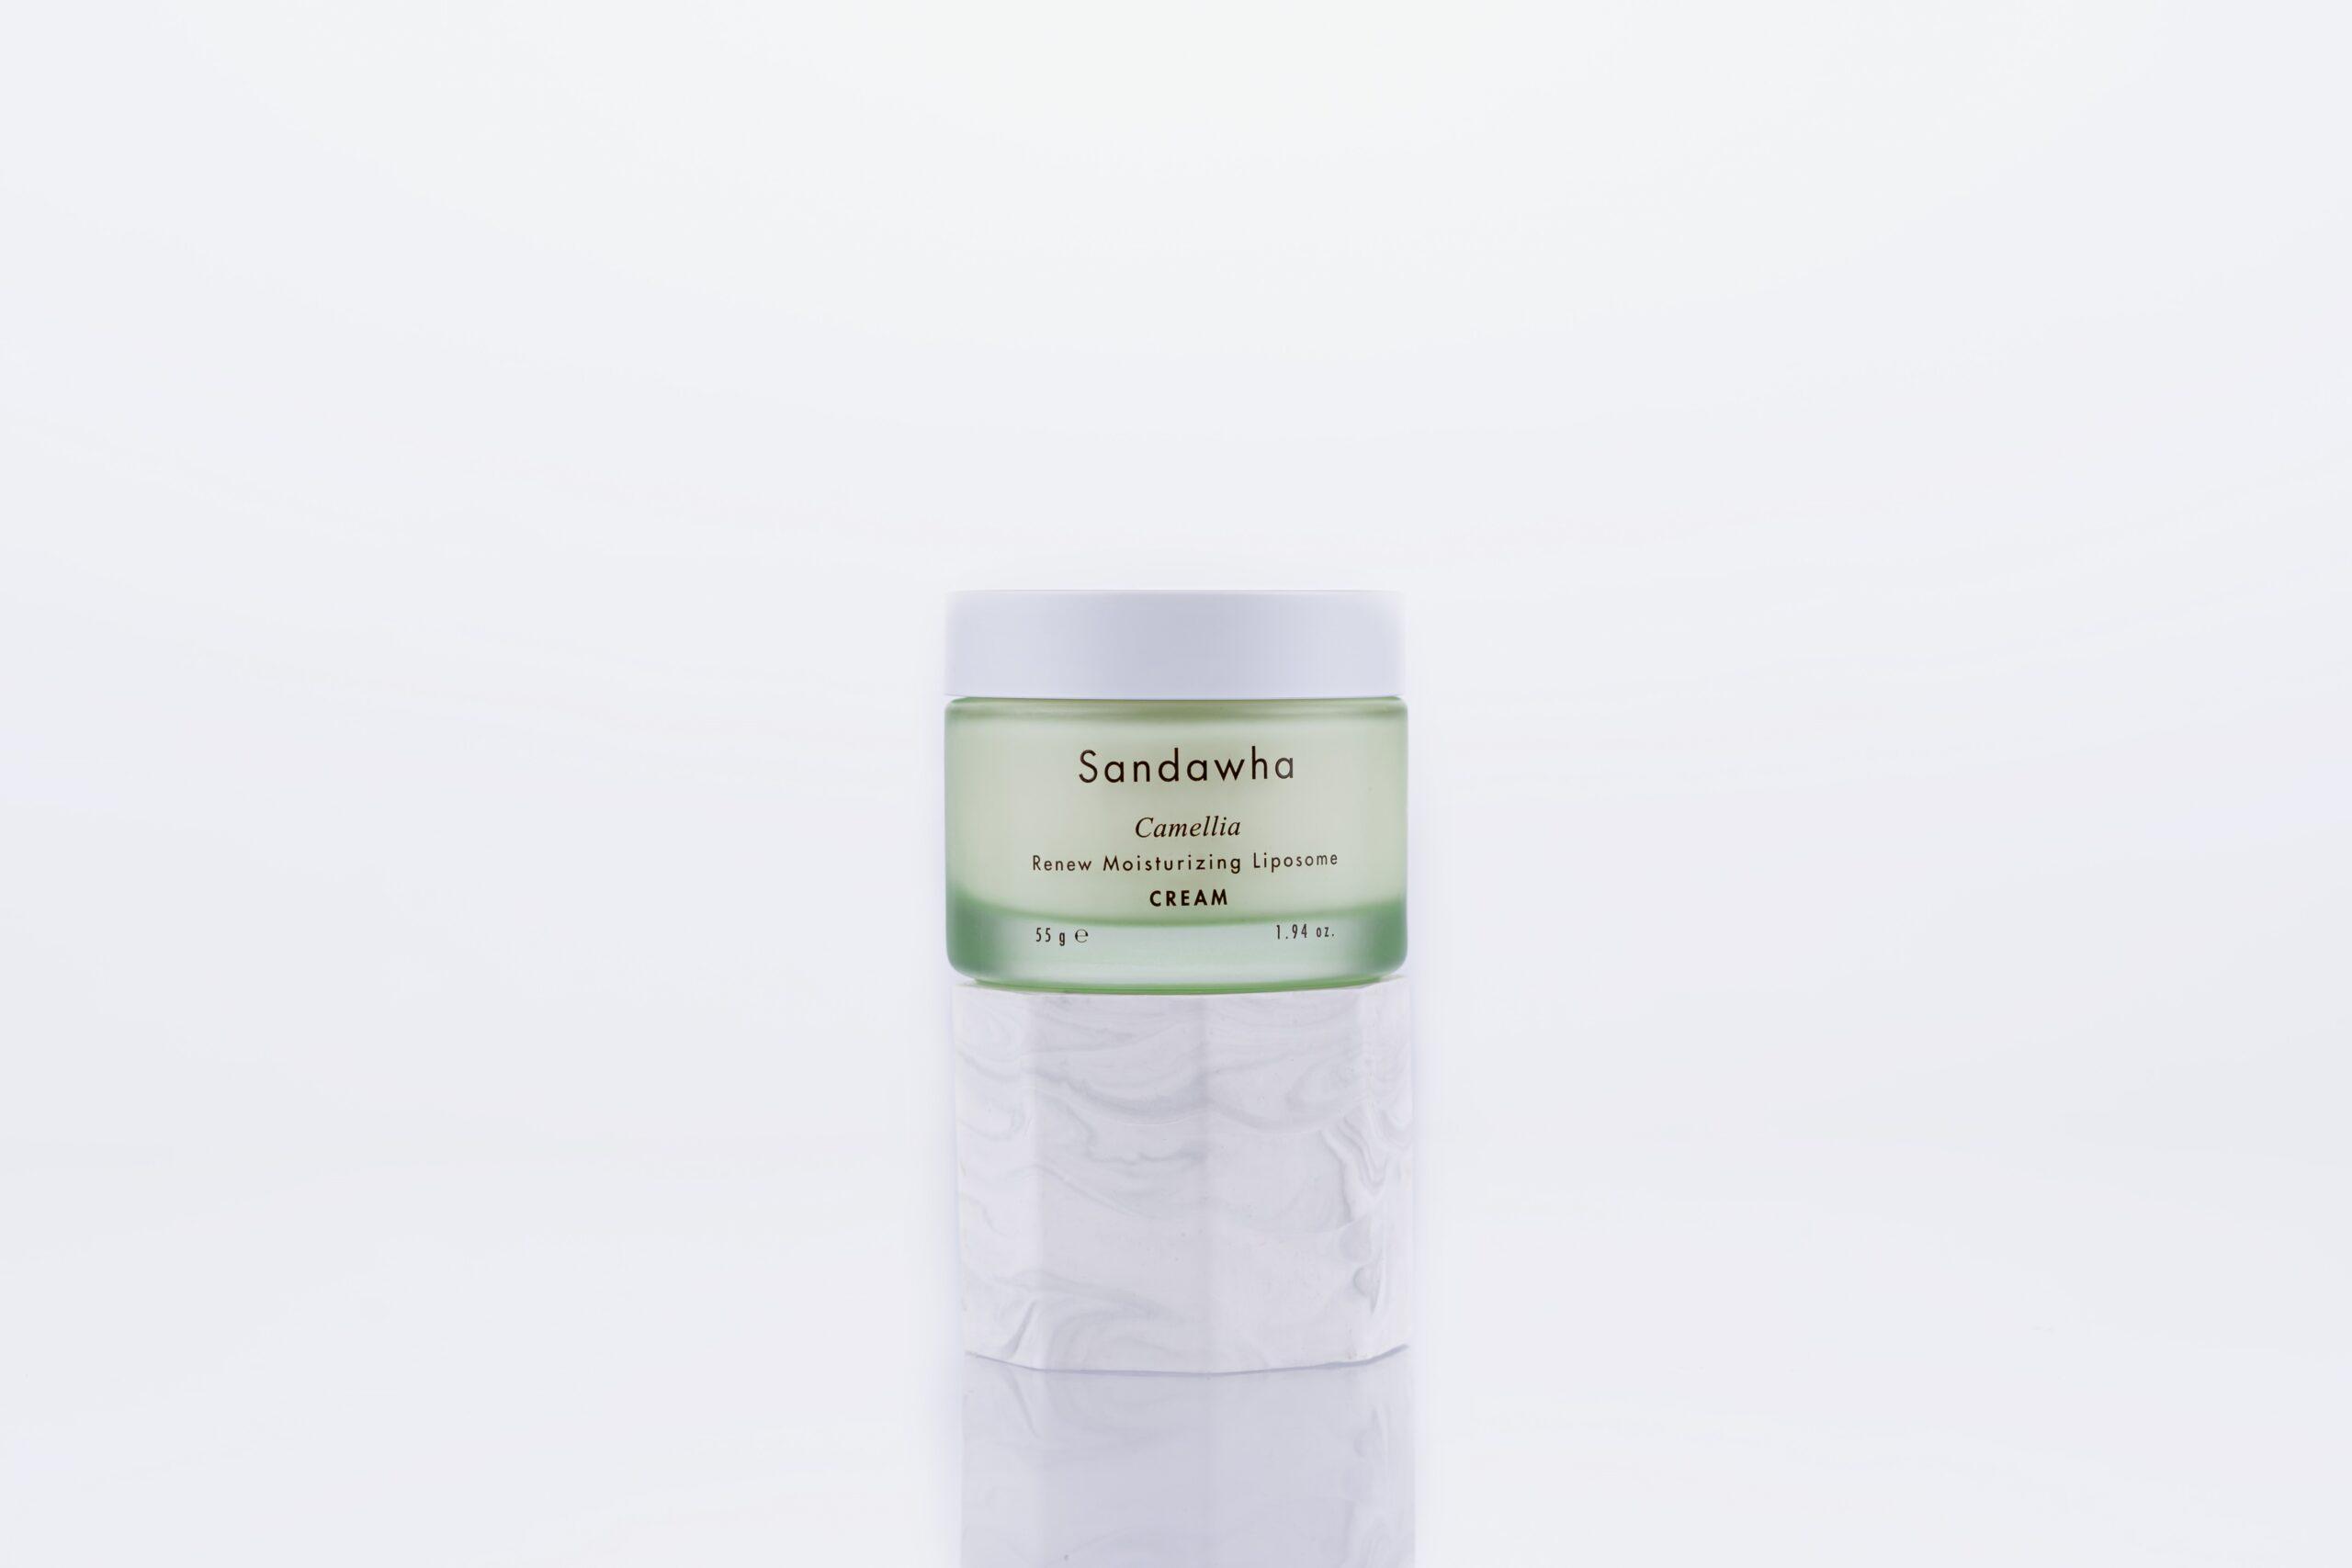 Sandawha ReNew Moisturising Liposome Cream Moisturising and Hydrating Skincare Products